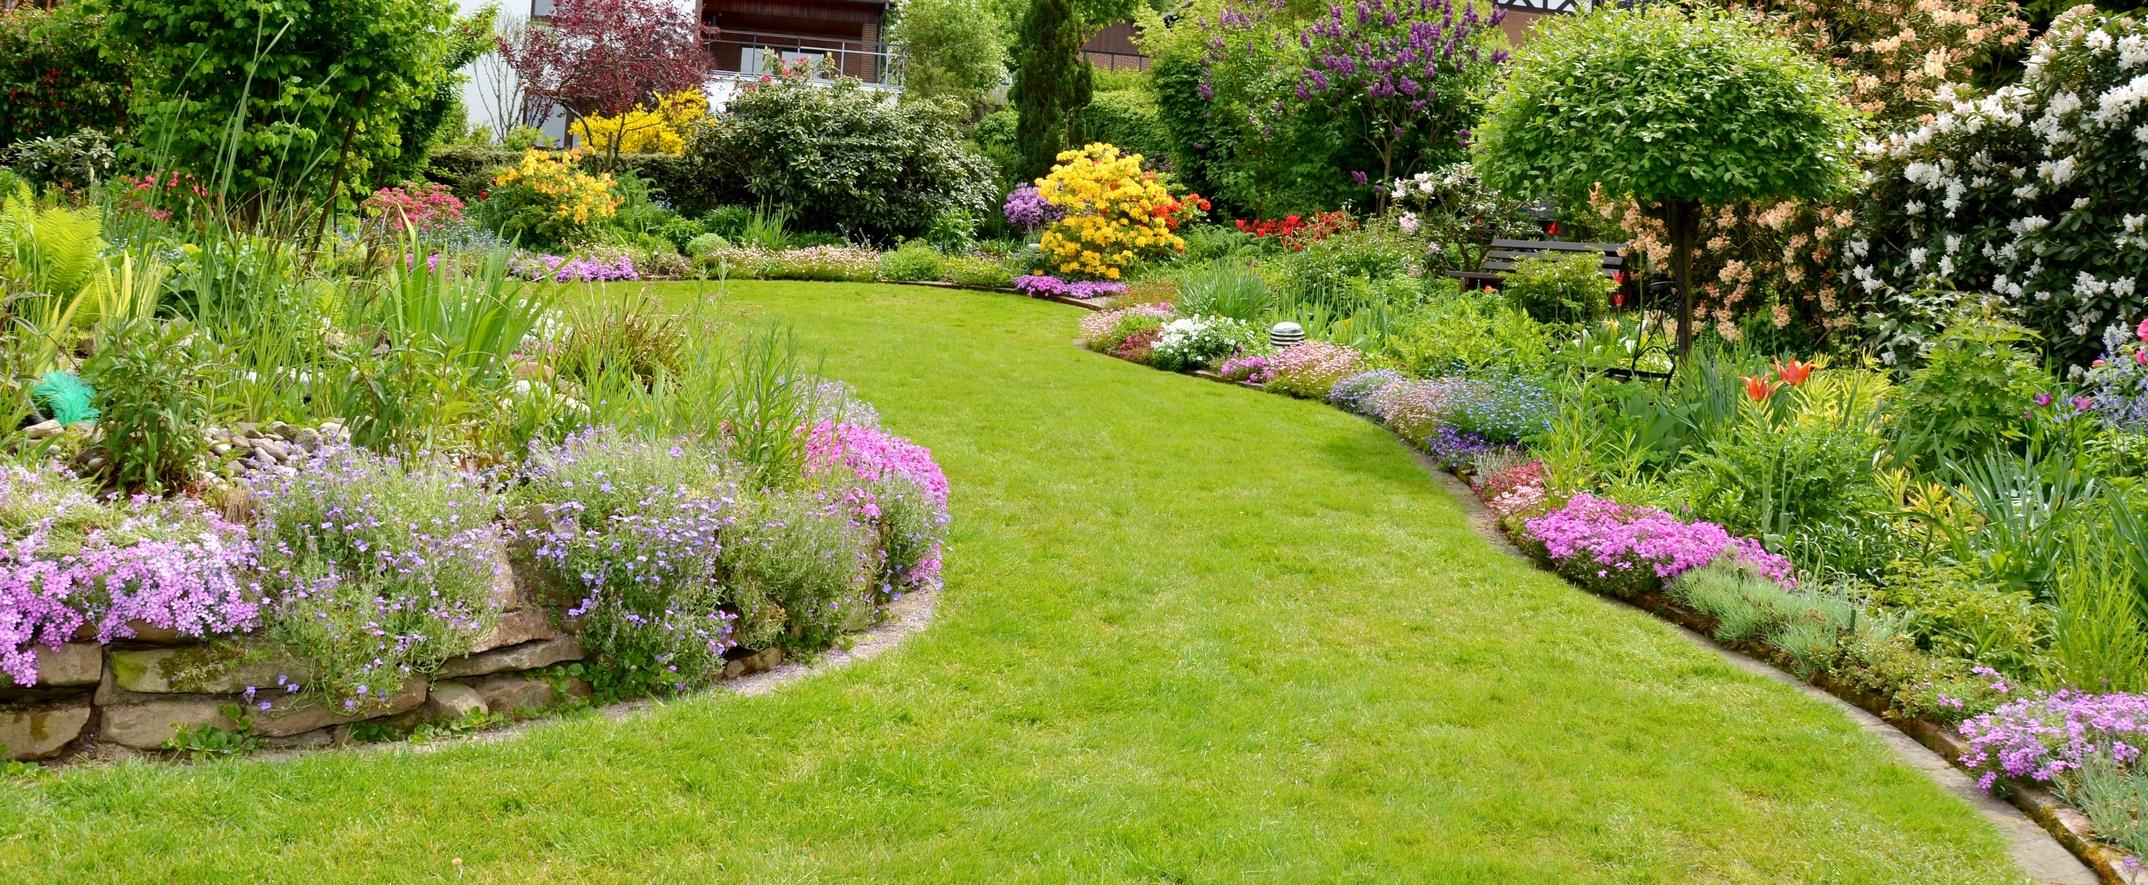 Giardini del volturno arte news for Accessoire jardin japonais